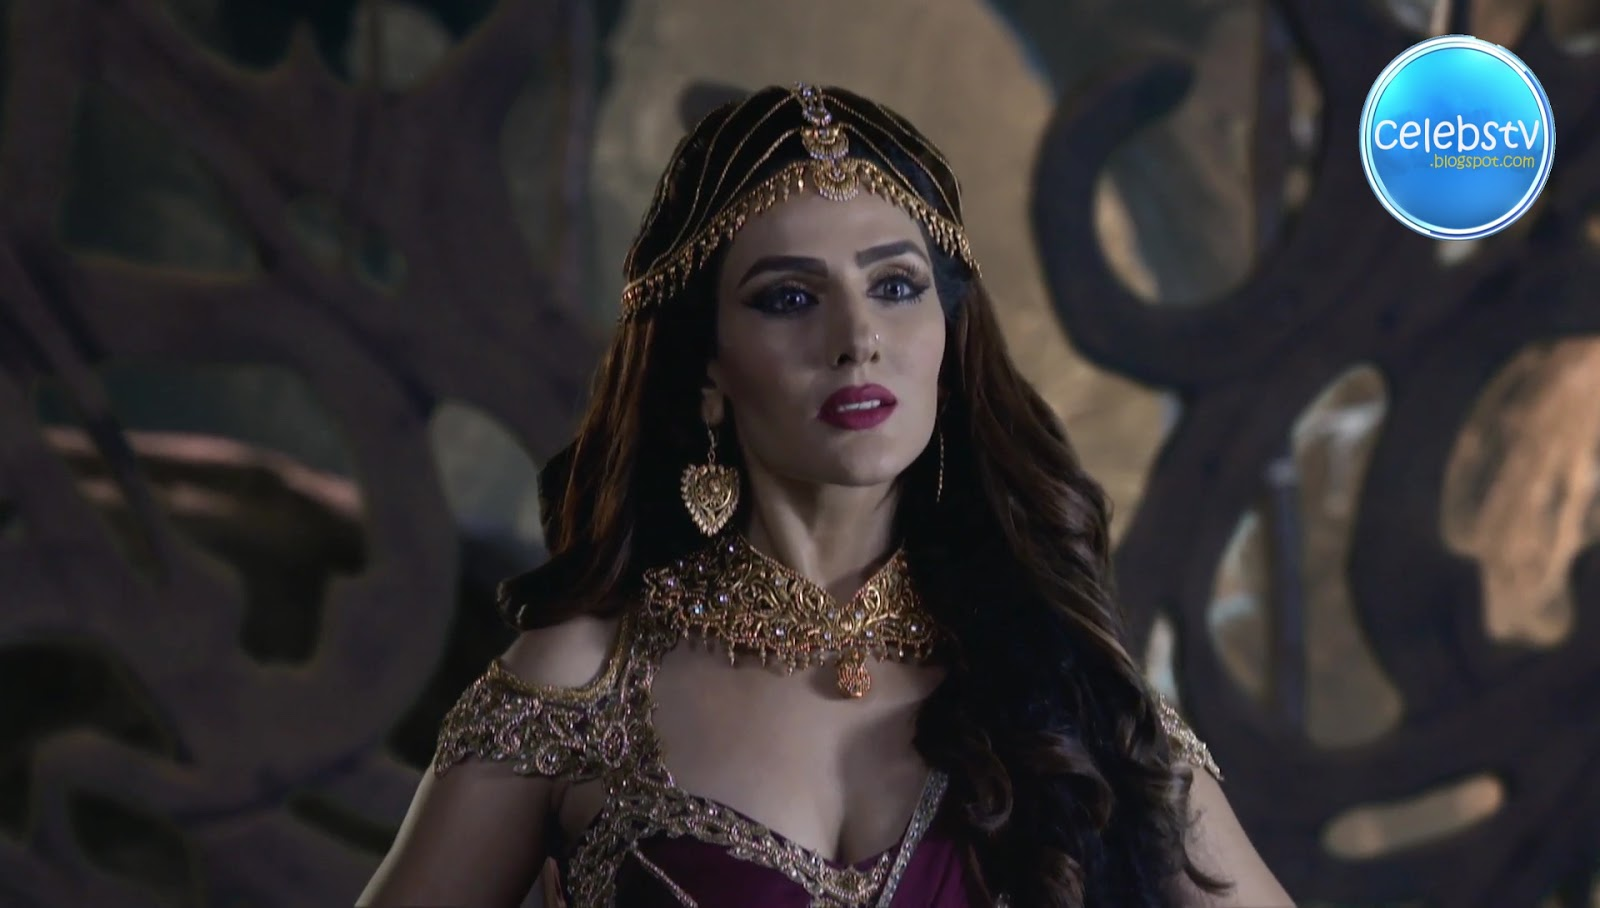 Sudeepa Singh Aka Rani Pari Very Hot Sexy Deep Cleavage -1713